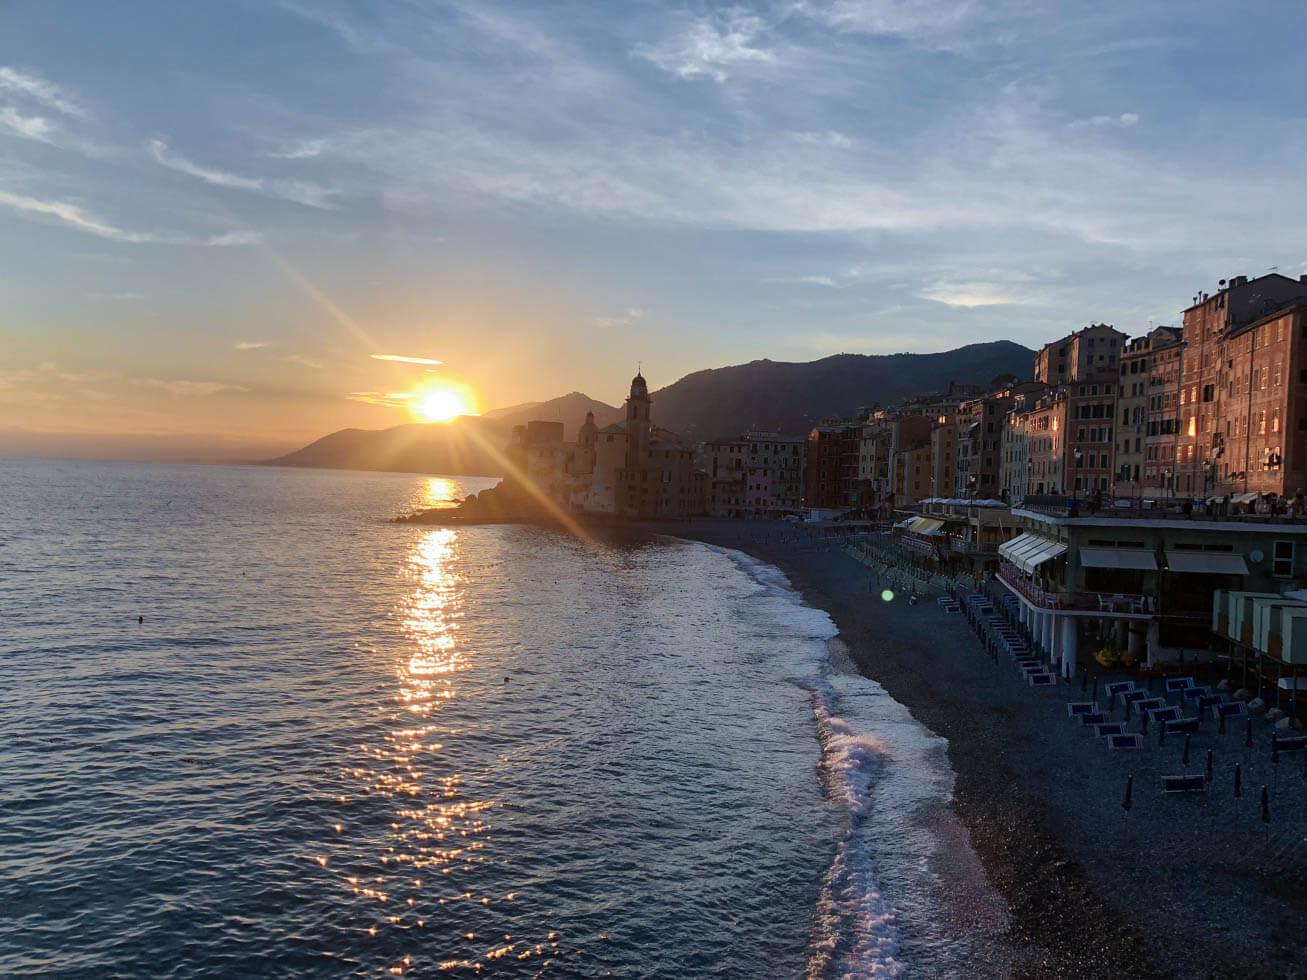 camogli sunset